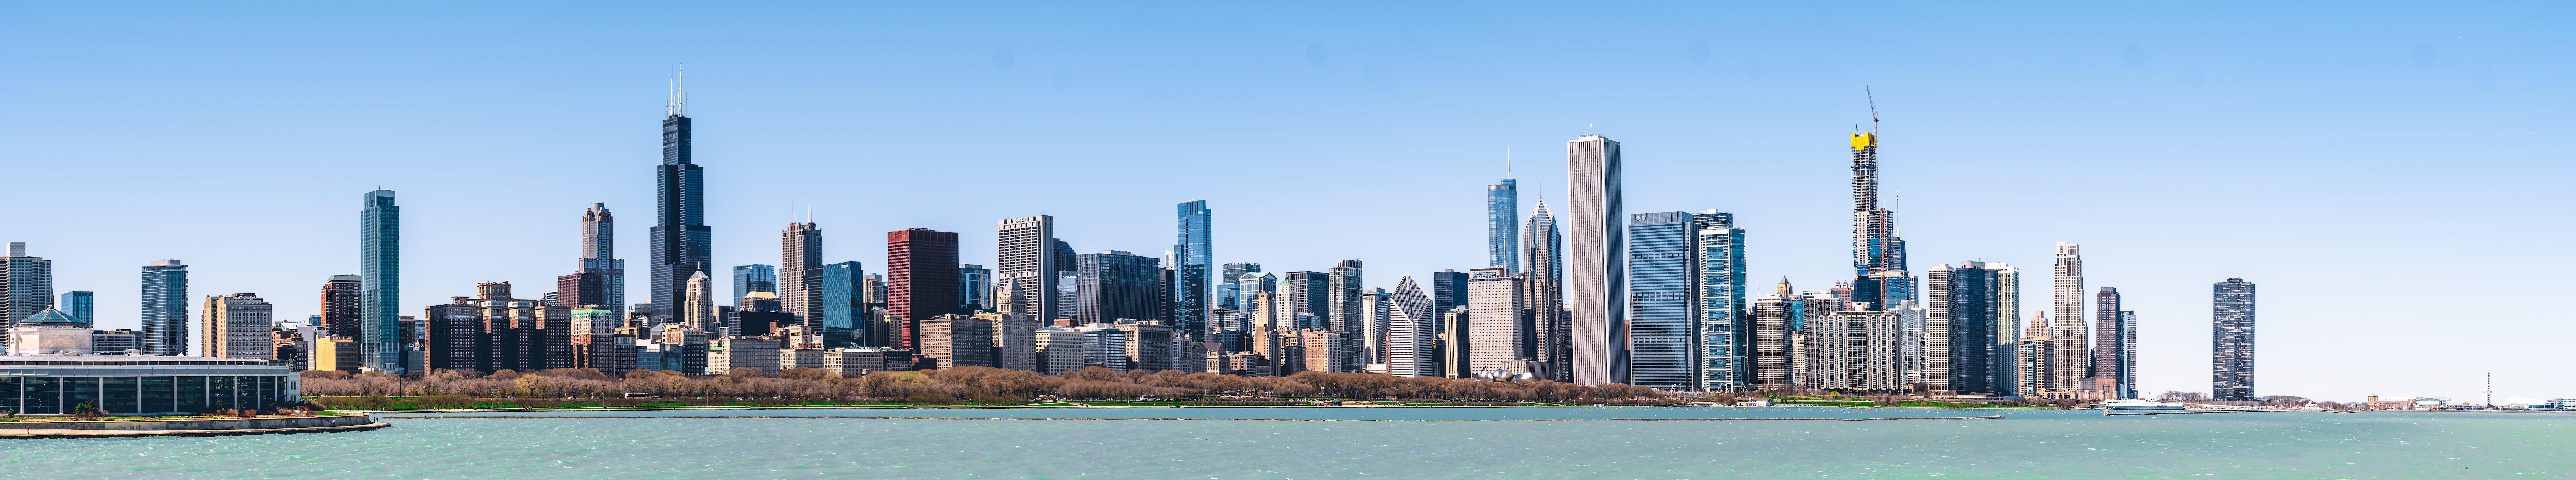 Kostenloses Stock Foto zu chicago, panoramablick, skyline